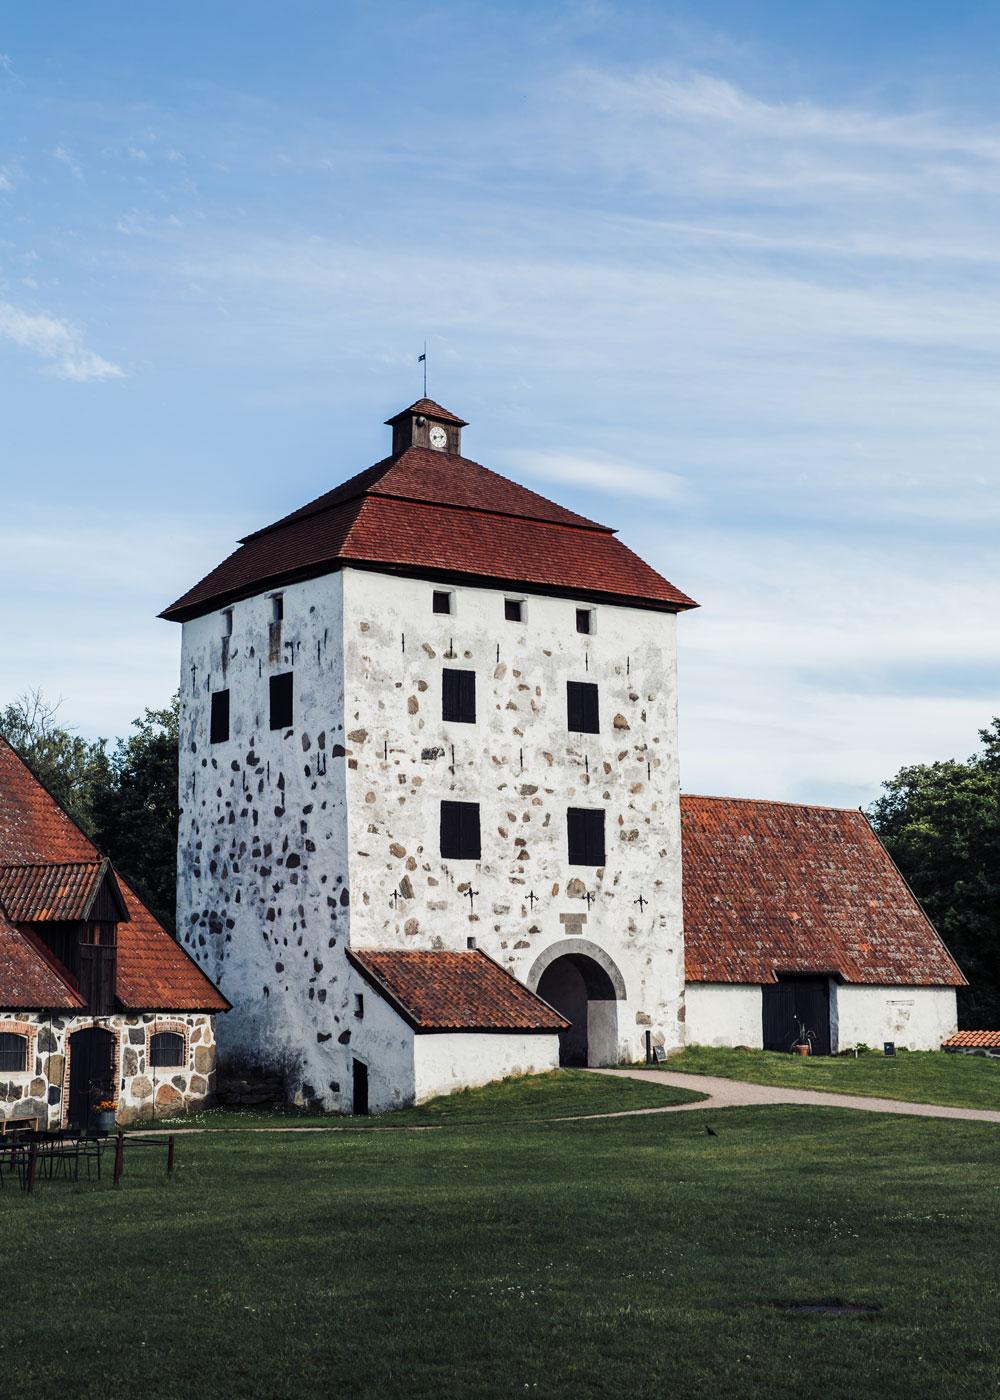 Hovdala castle